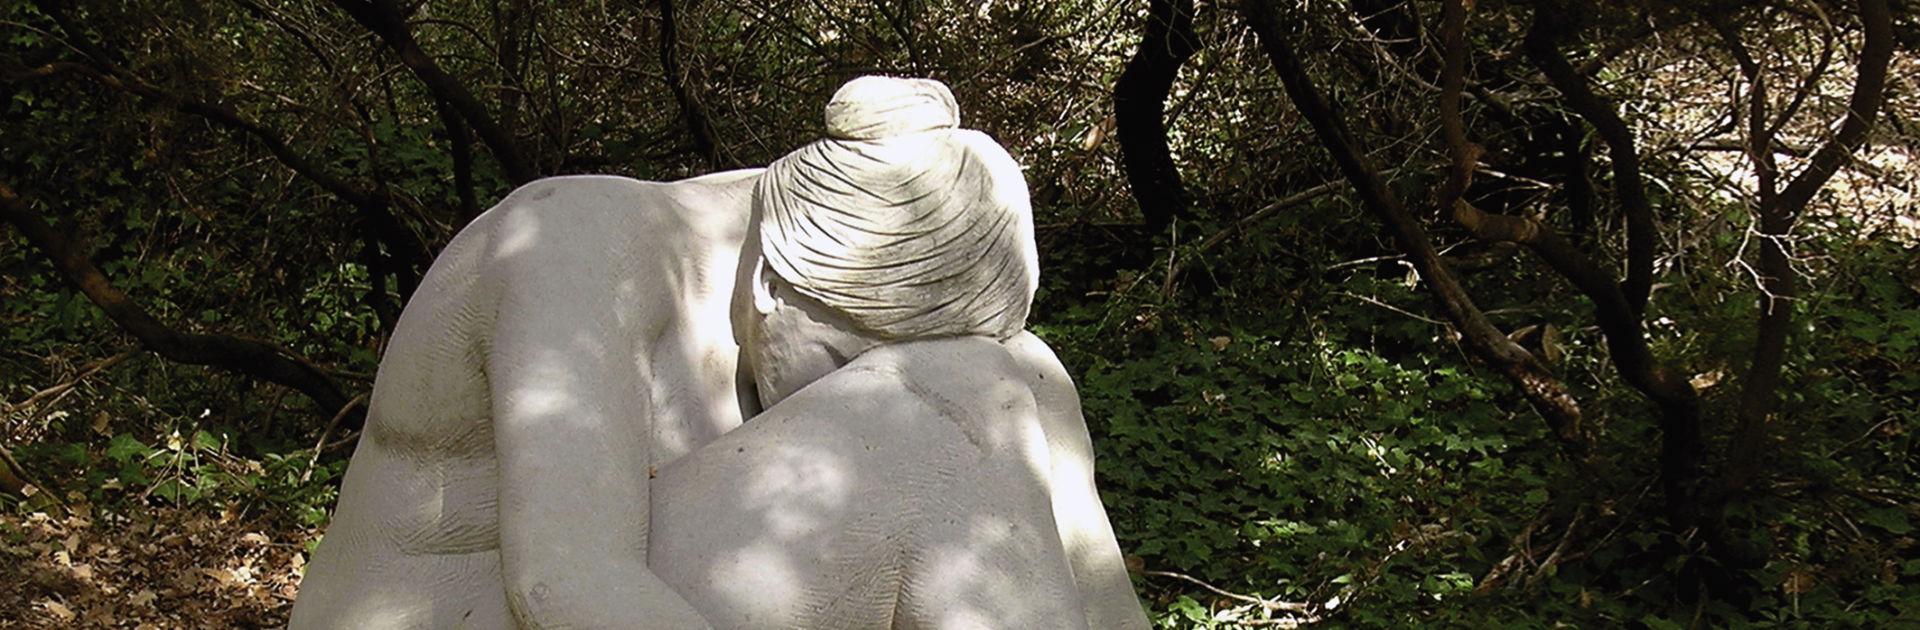 Künstler Roland Topor im Giardino di Daniel Spoerri